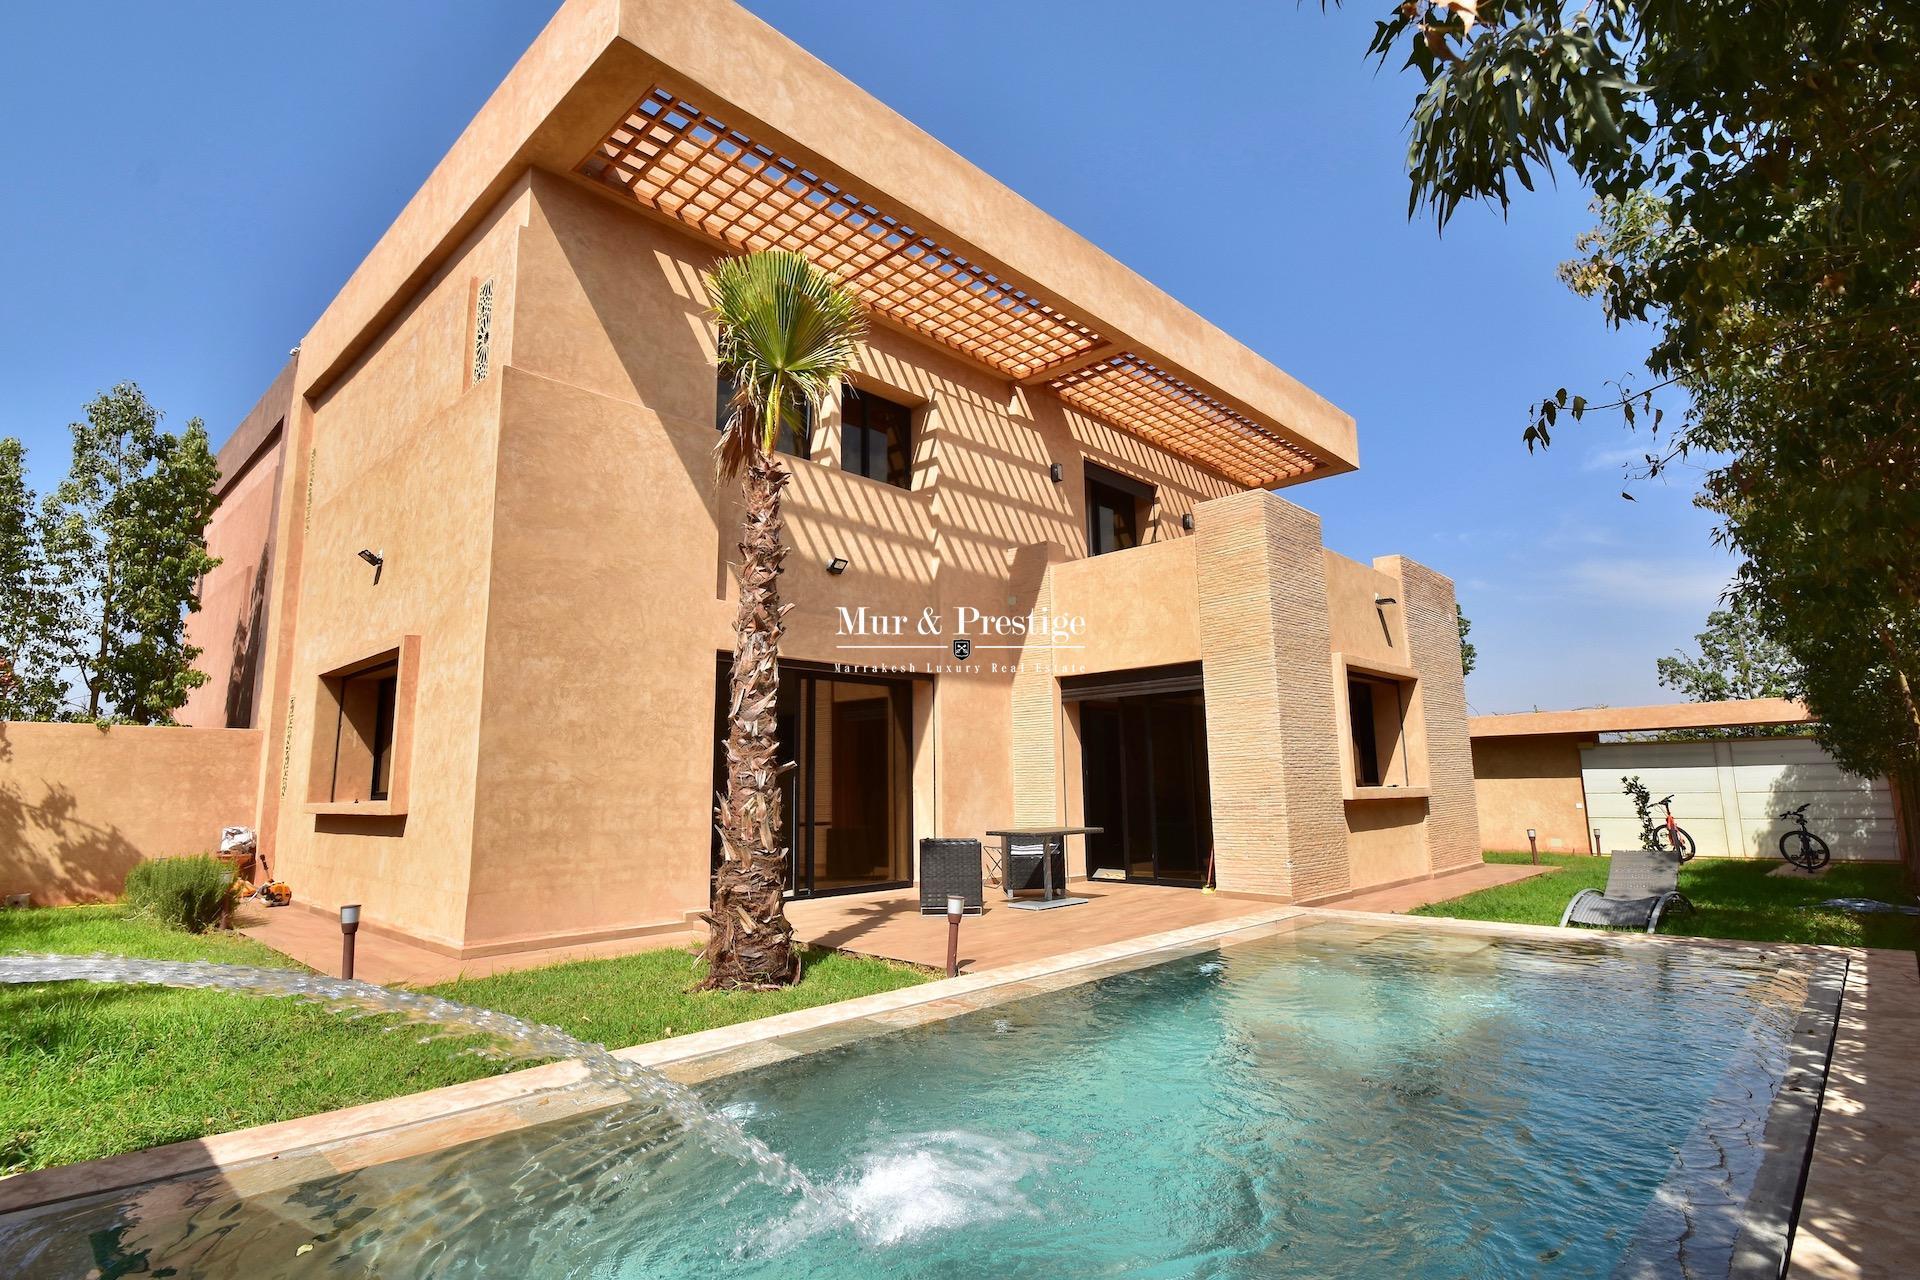 Agence Immobilière Marrakech - Vente Maison Moderne